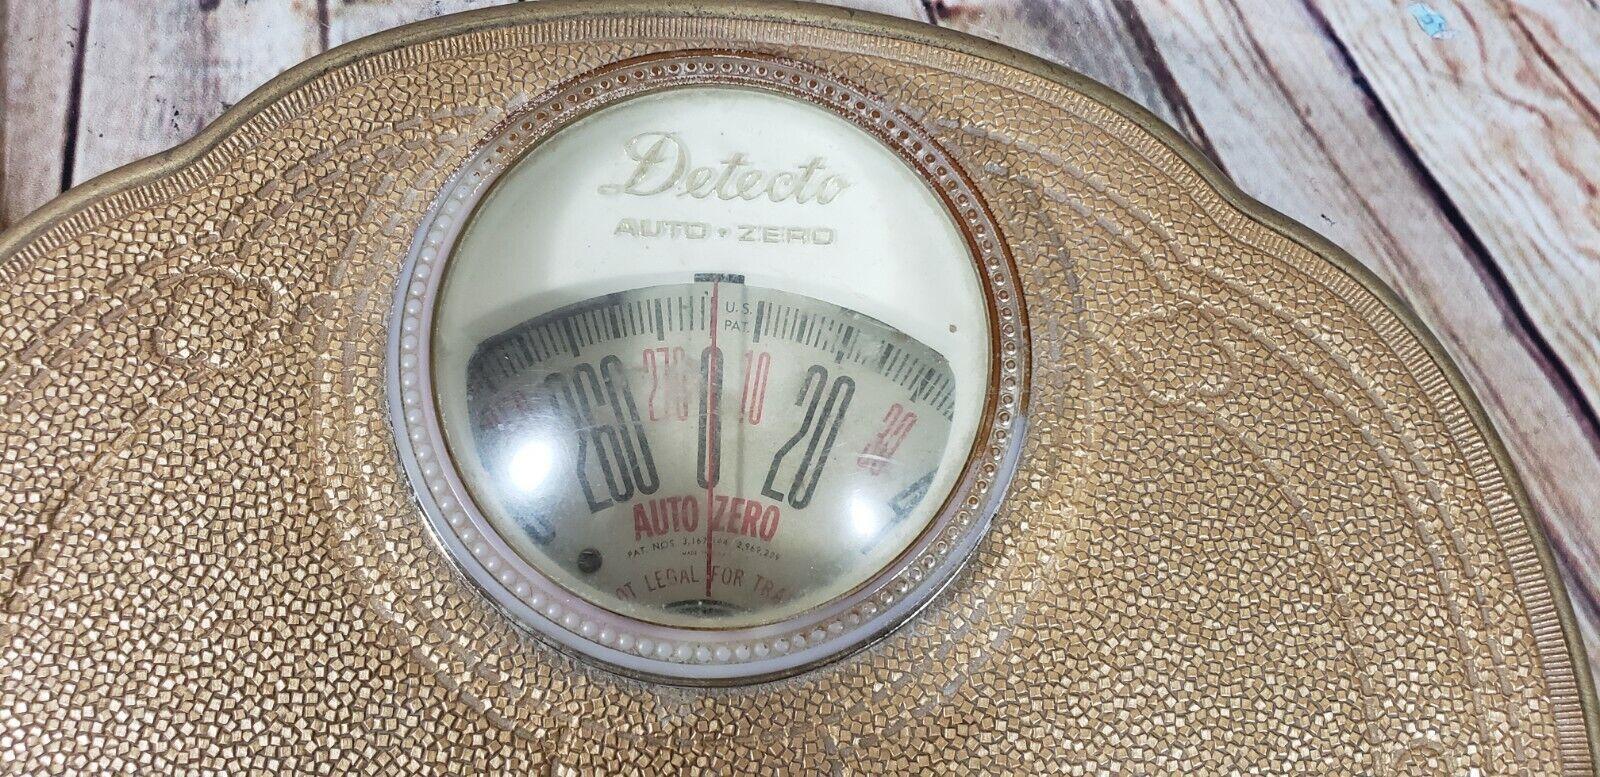 Vintage Detecto Floral Metal Bathroom Scale 60s Style